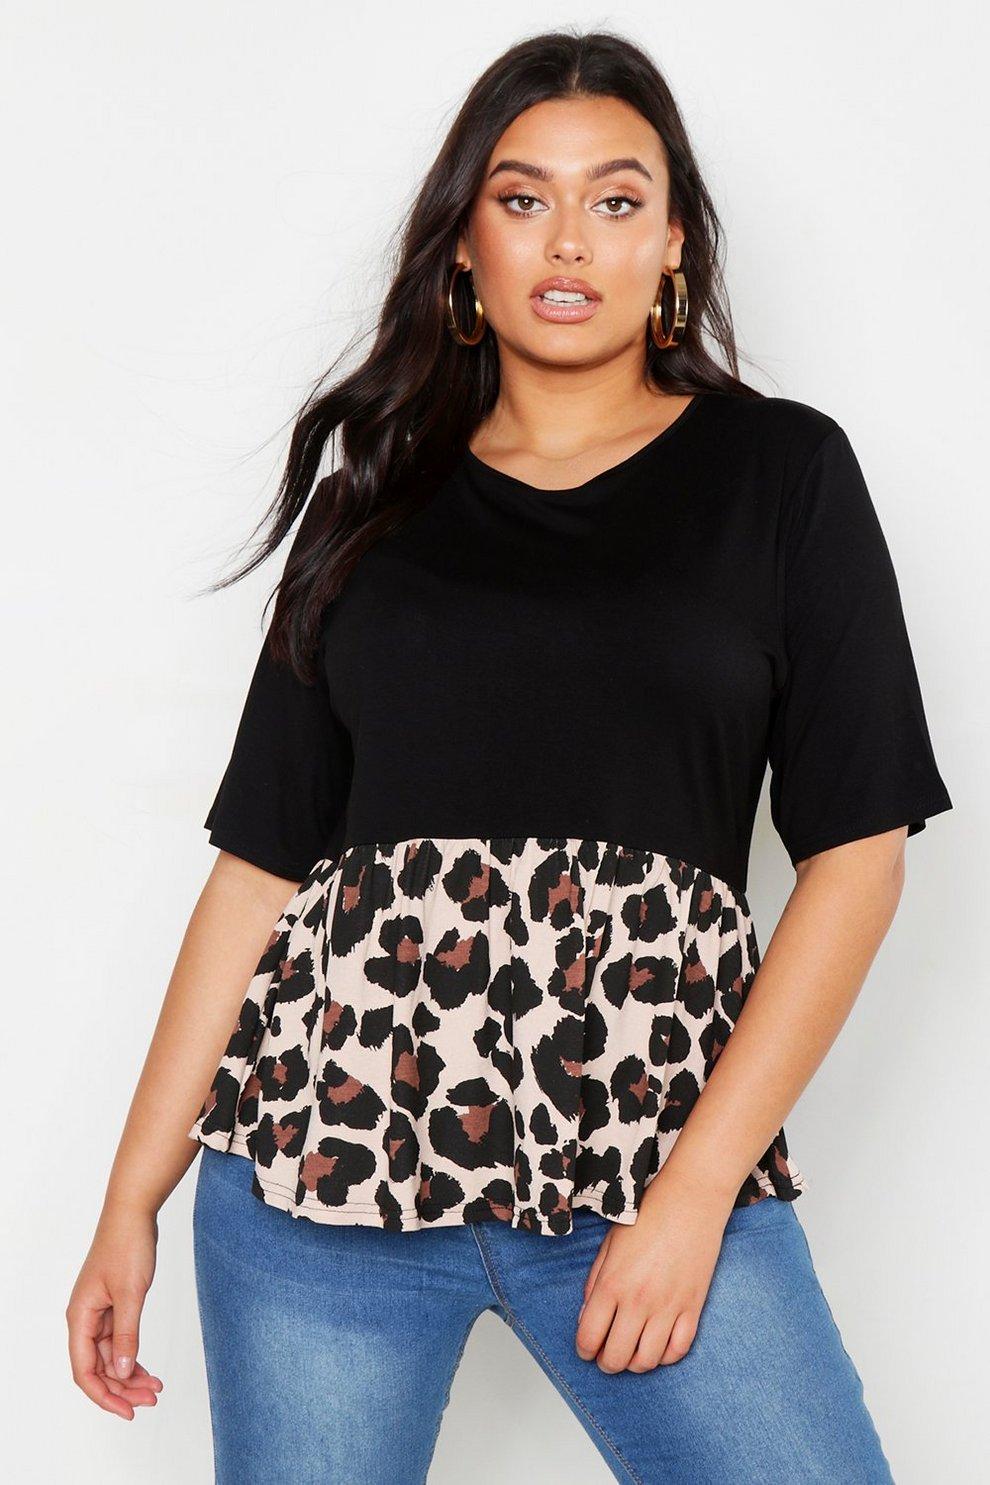 Plus Size T Shirt mit Leopardenmuster und Materialmix | Boohoo